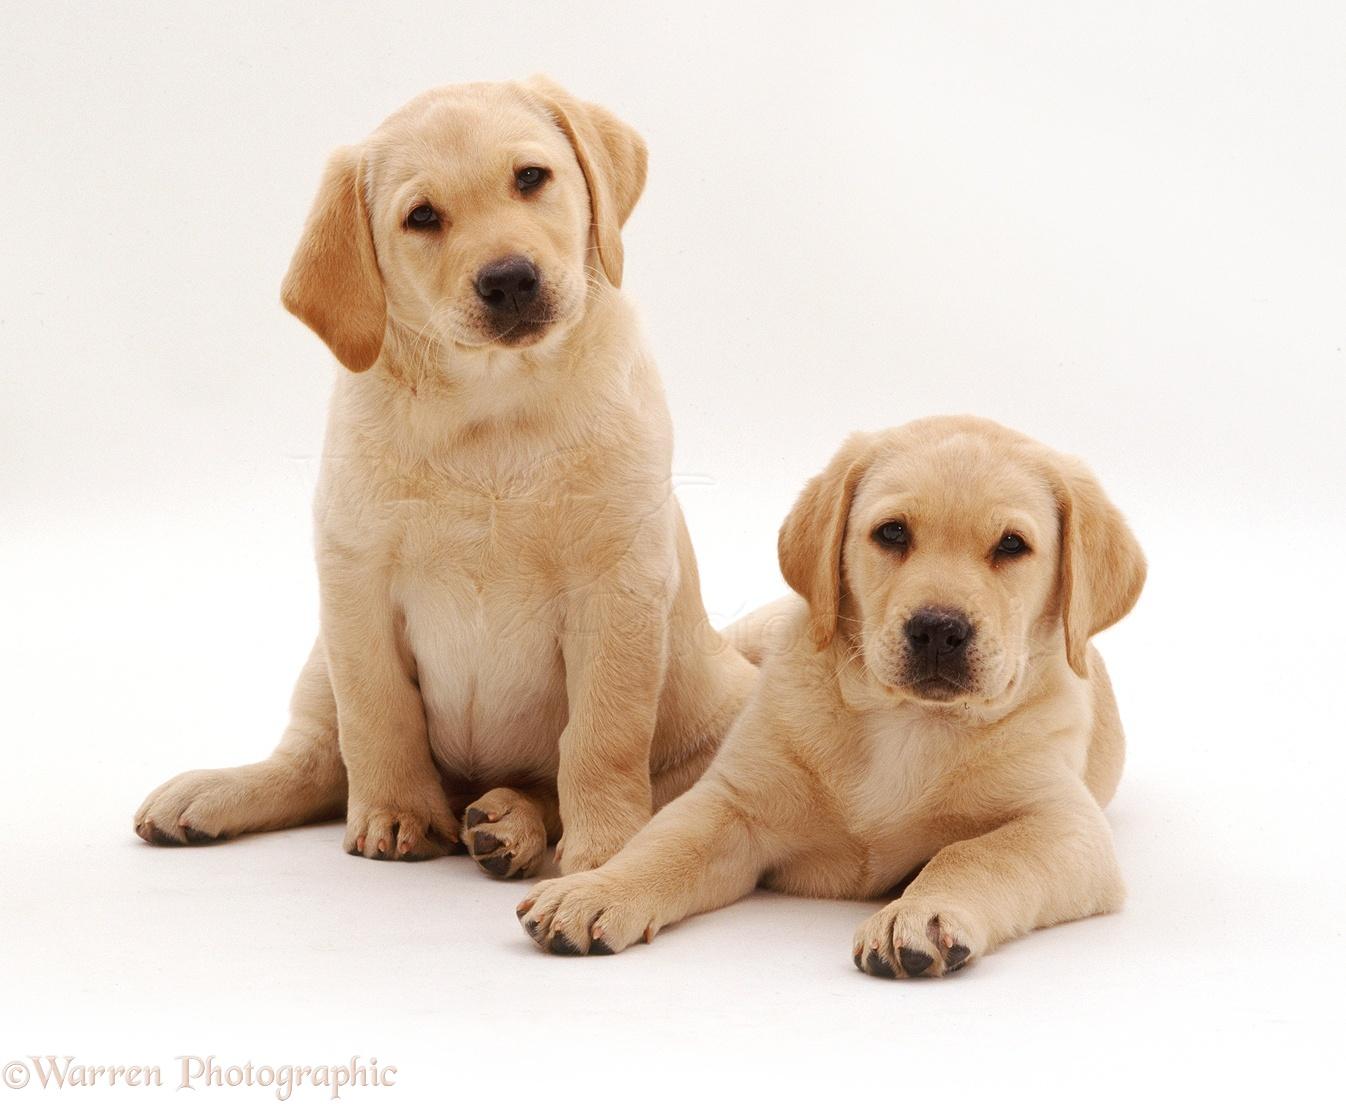 Yellow Background Dogs: Labrador pups ph...